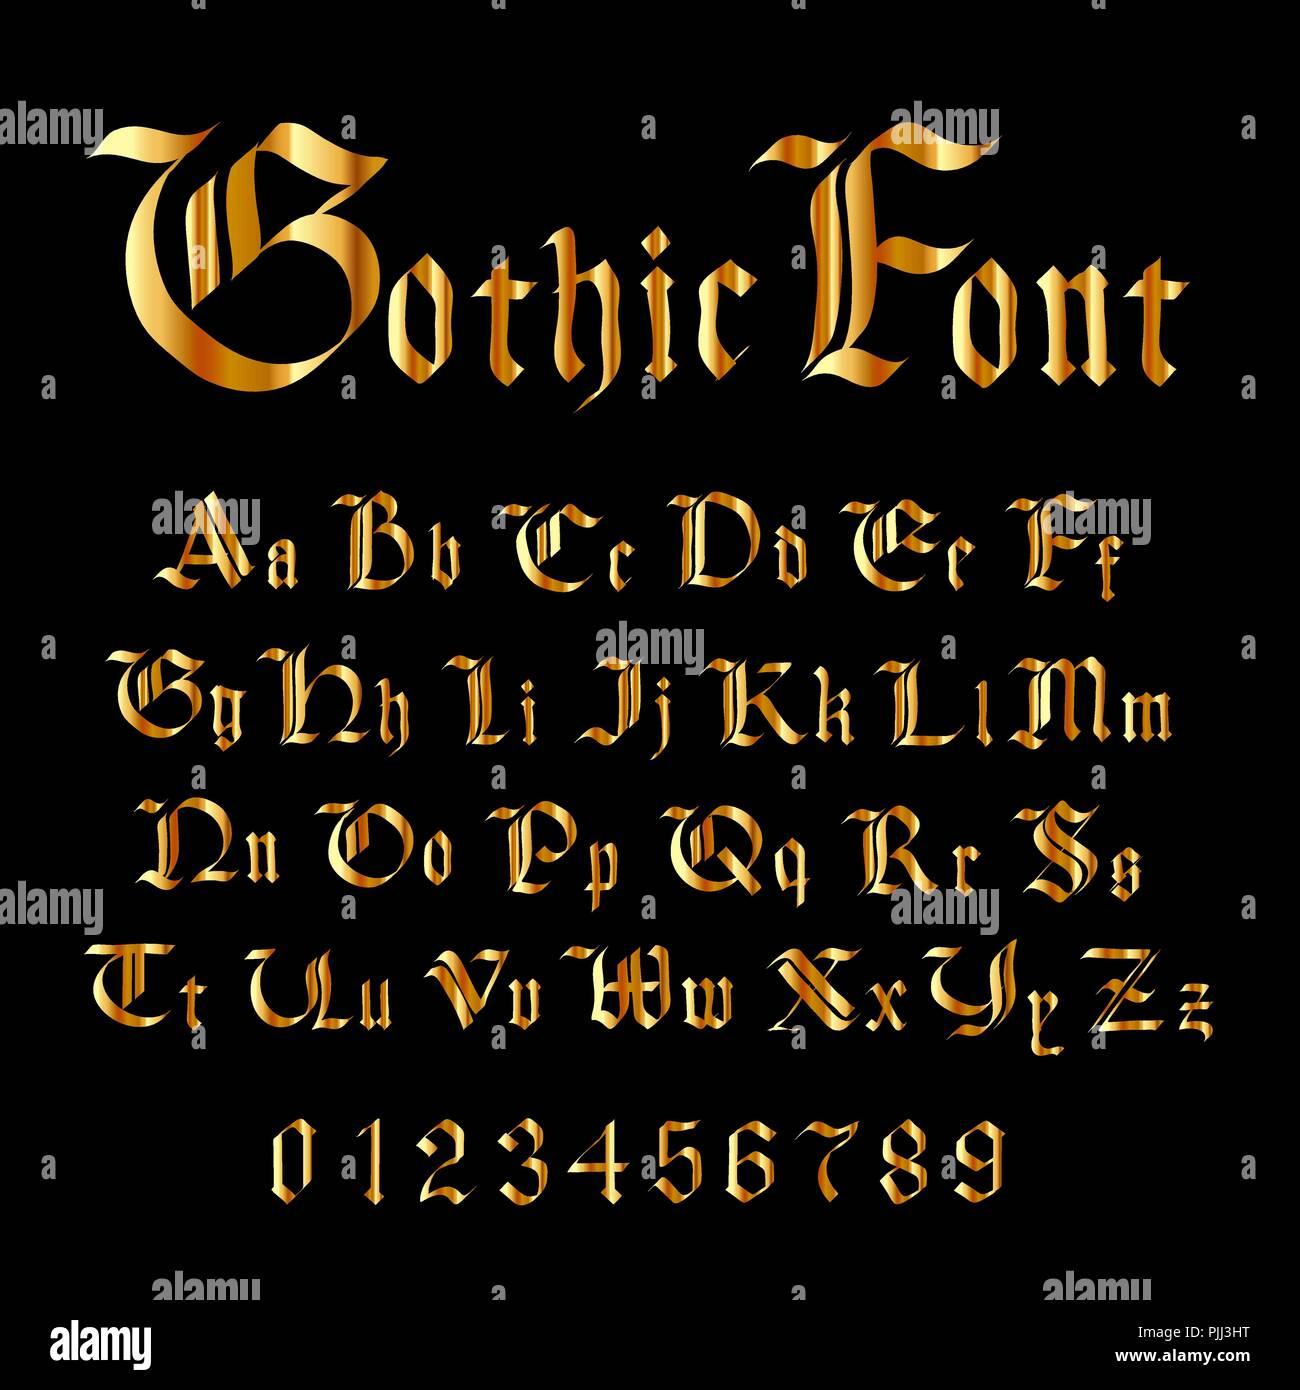 medieval alphabet stockfotos medieval alphabet bilder seite 3 alamy. Black Bedroom Furniture Sets. Home Design Ideas